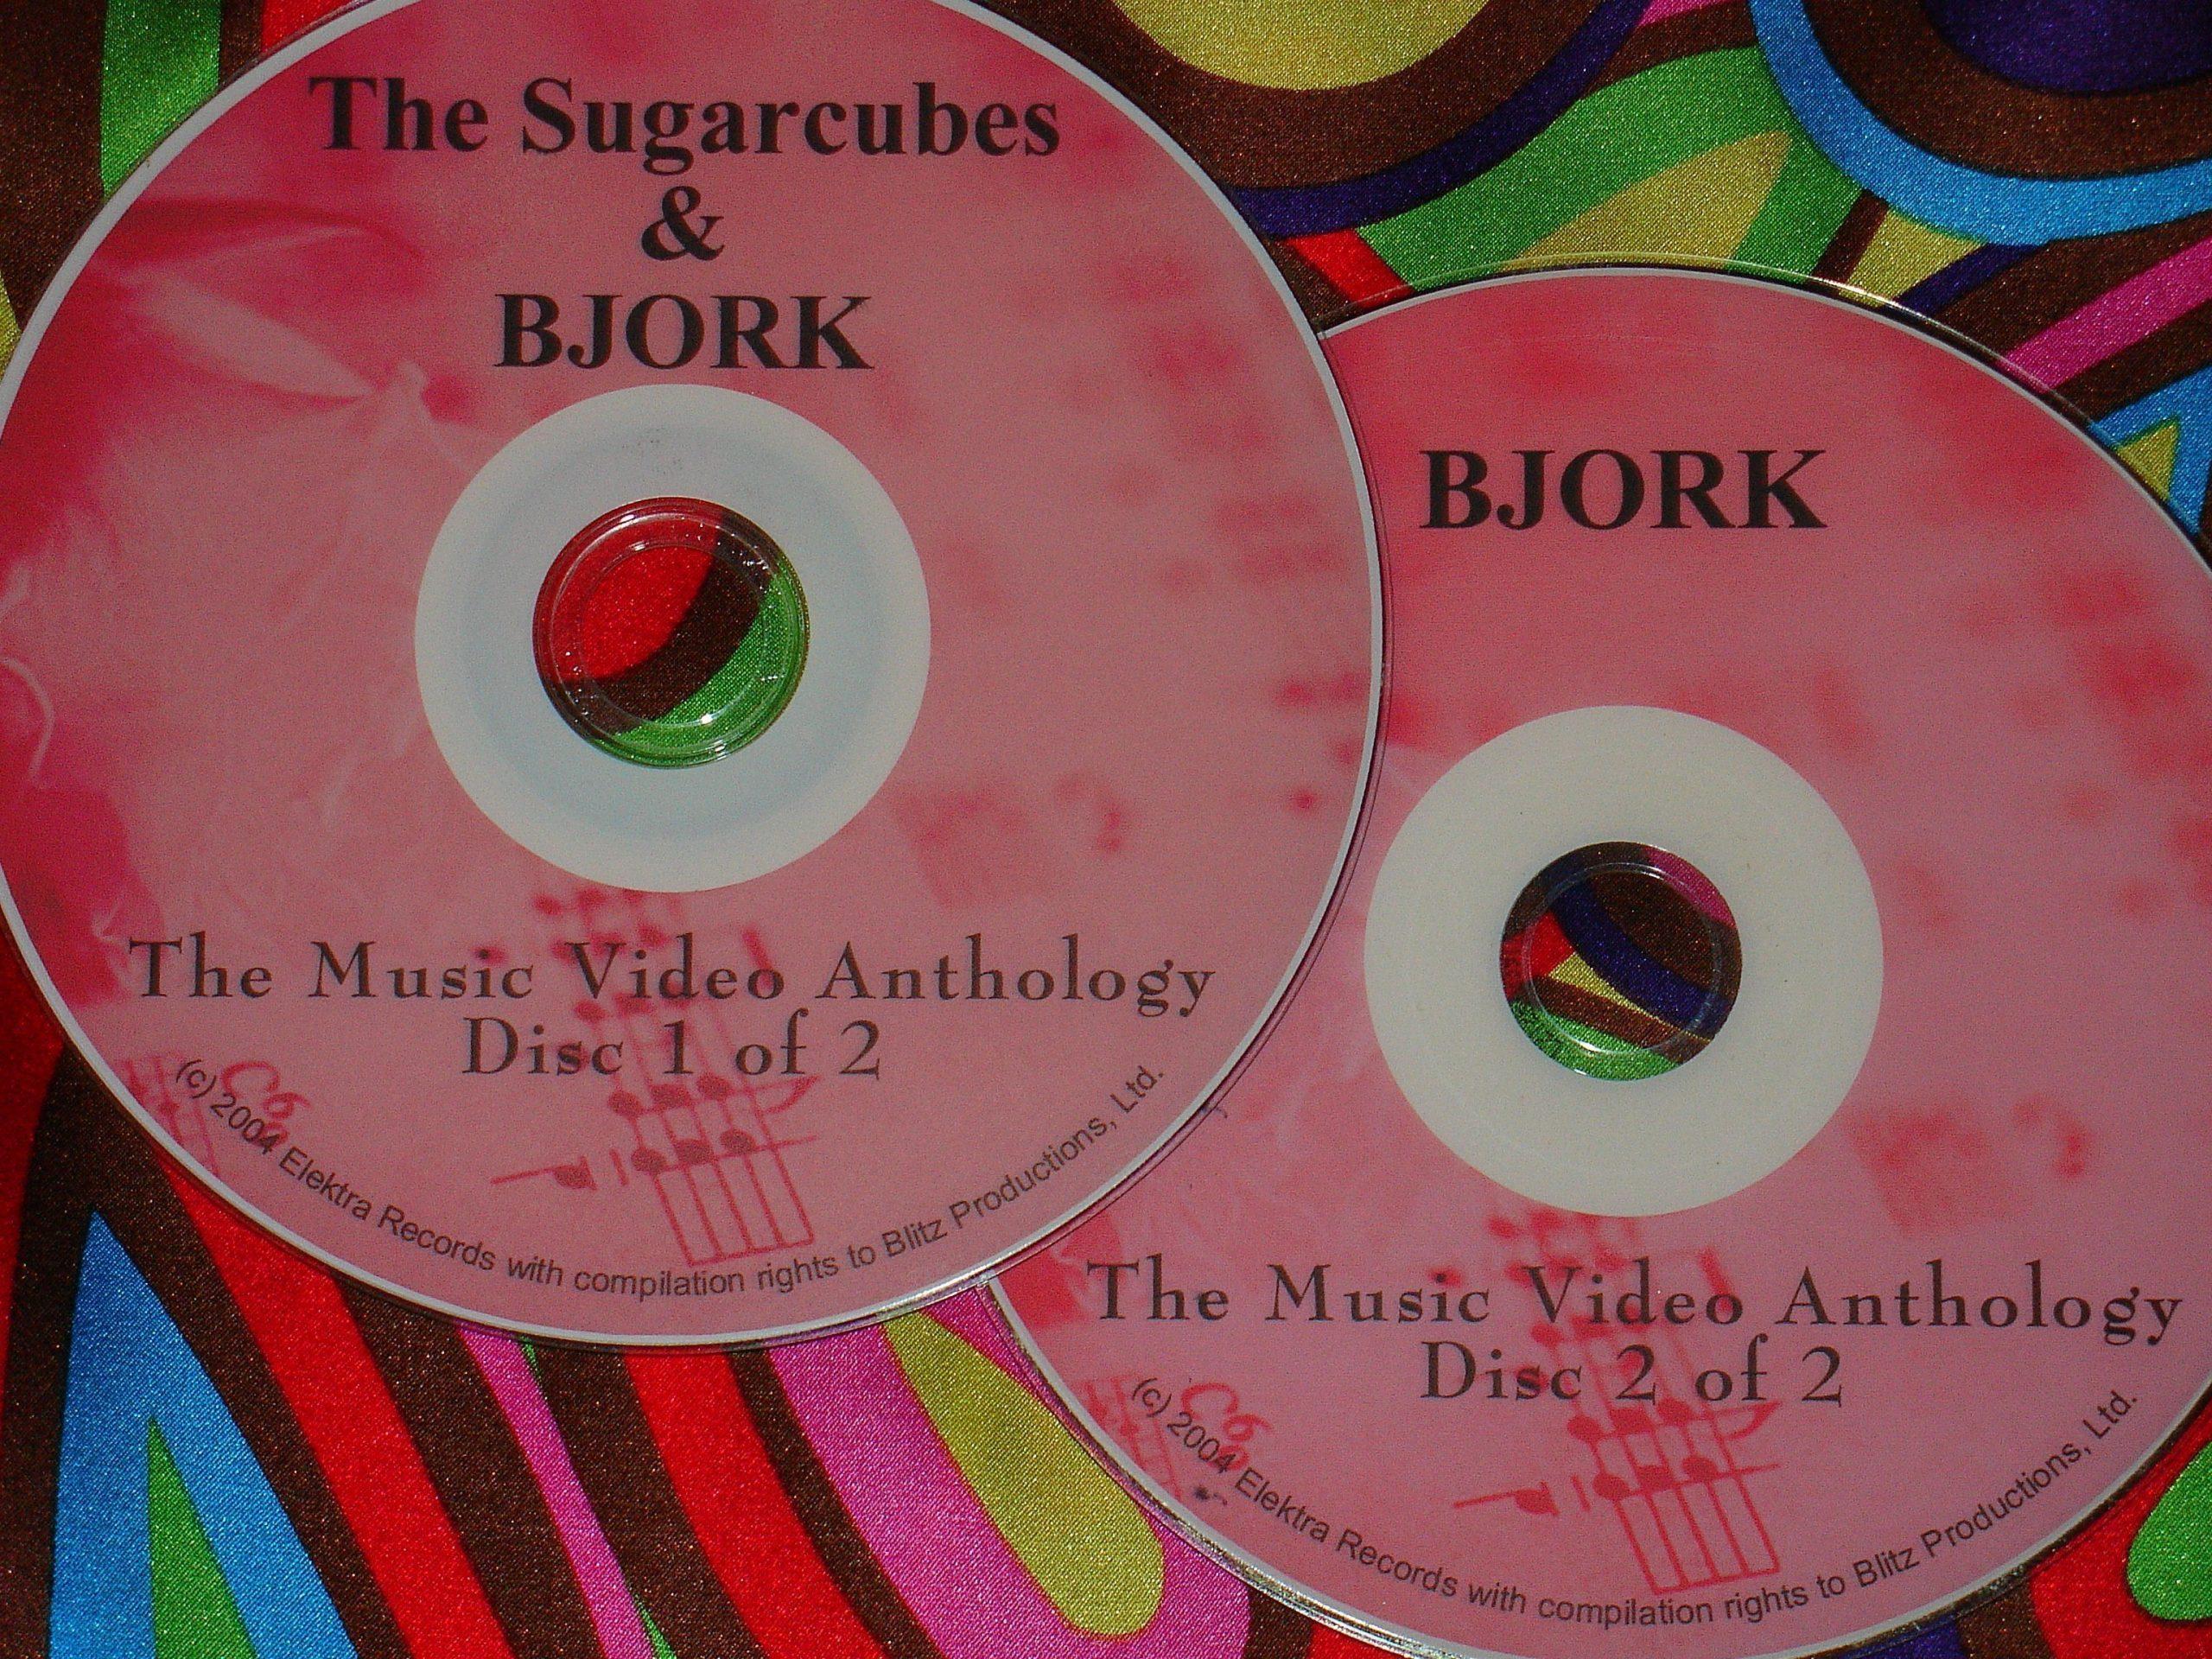 Bjork & Sugar Cubes Music Video Anthology 1986-2011 (2 DVD Set 2 Hours 50 Minutes)